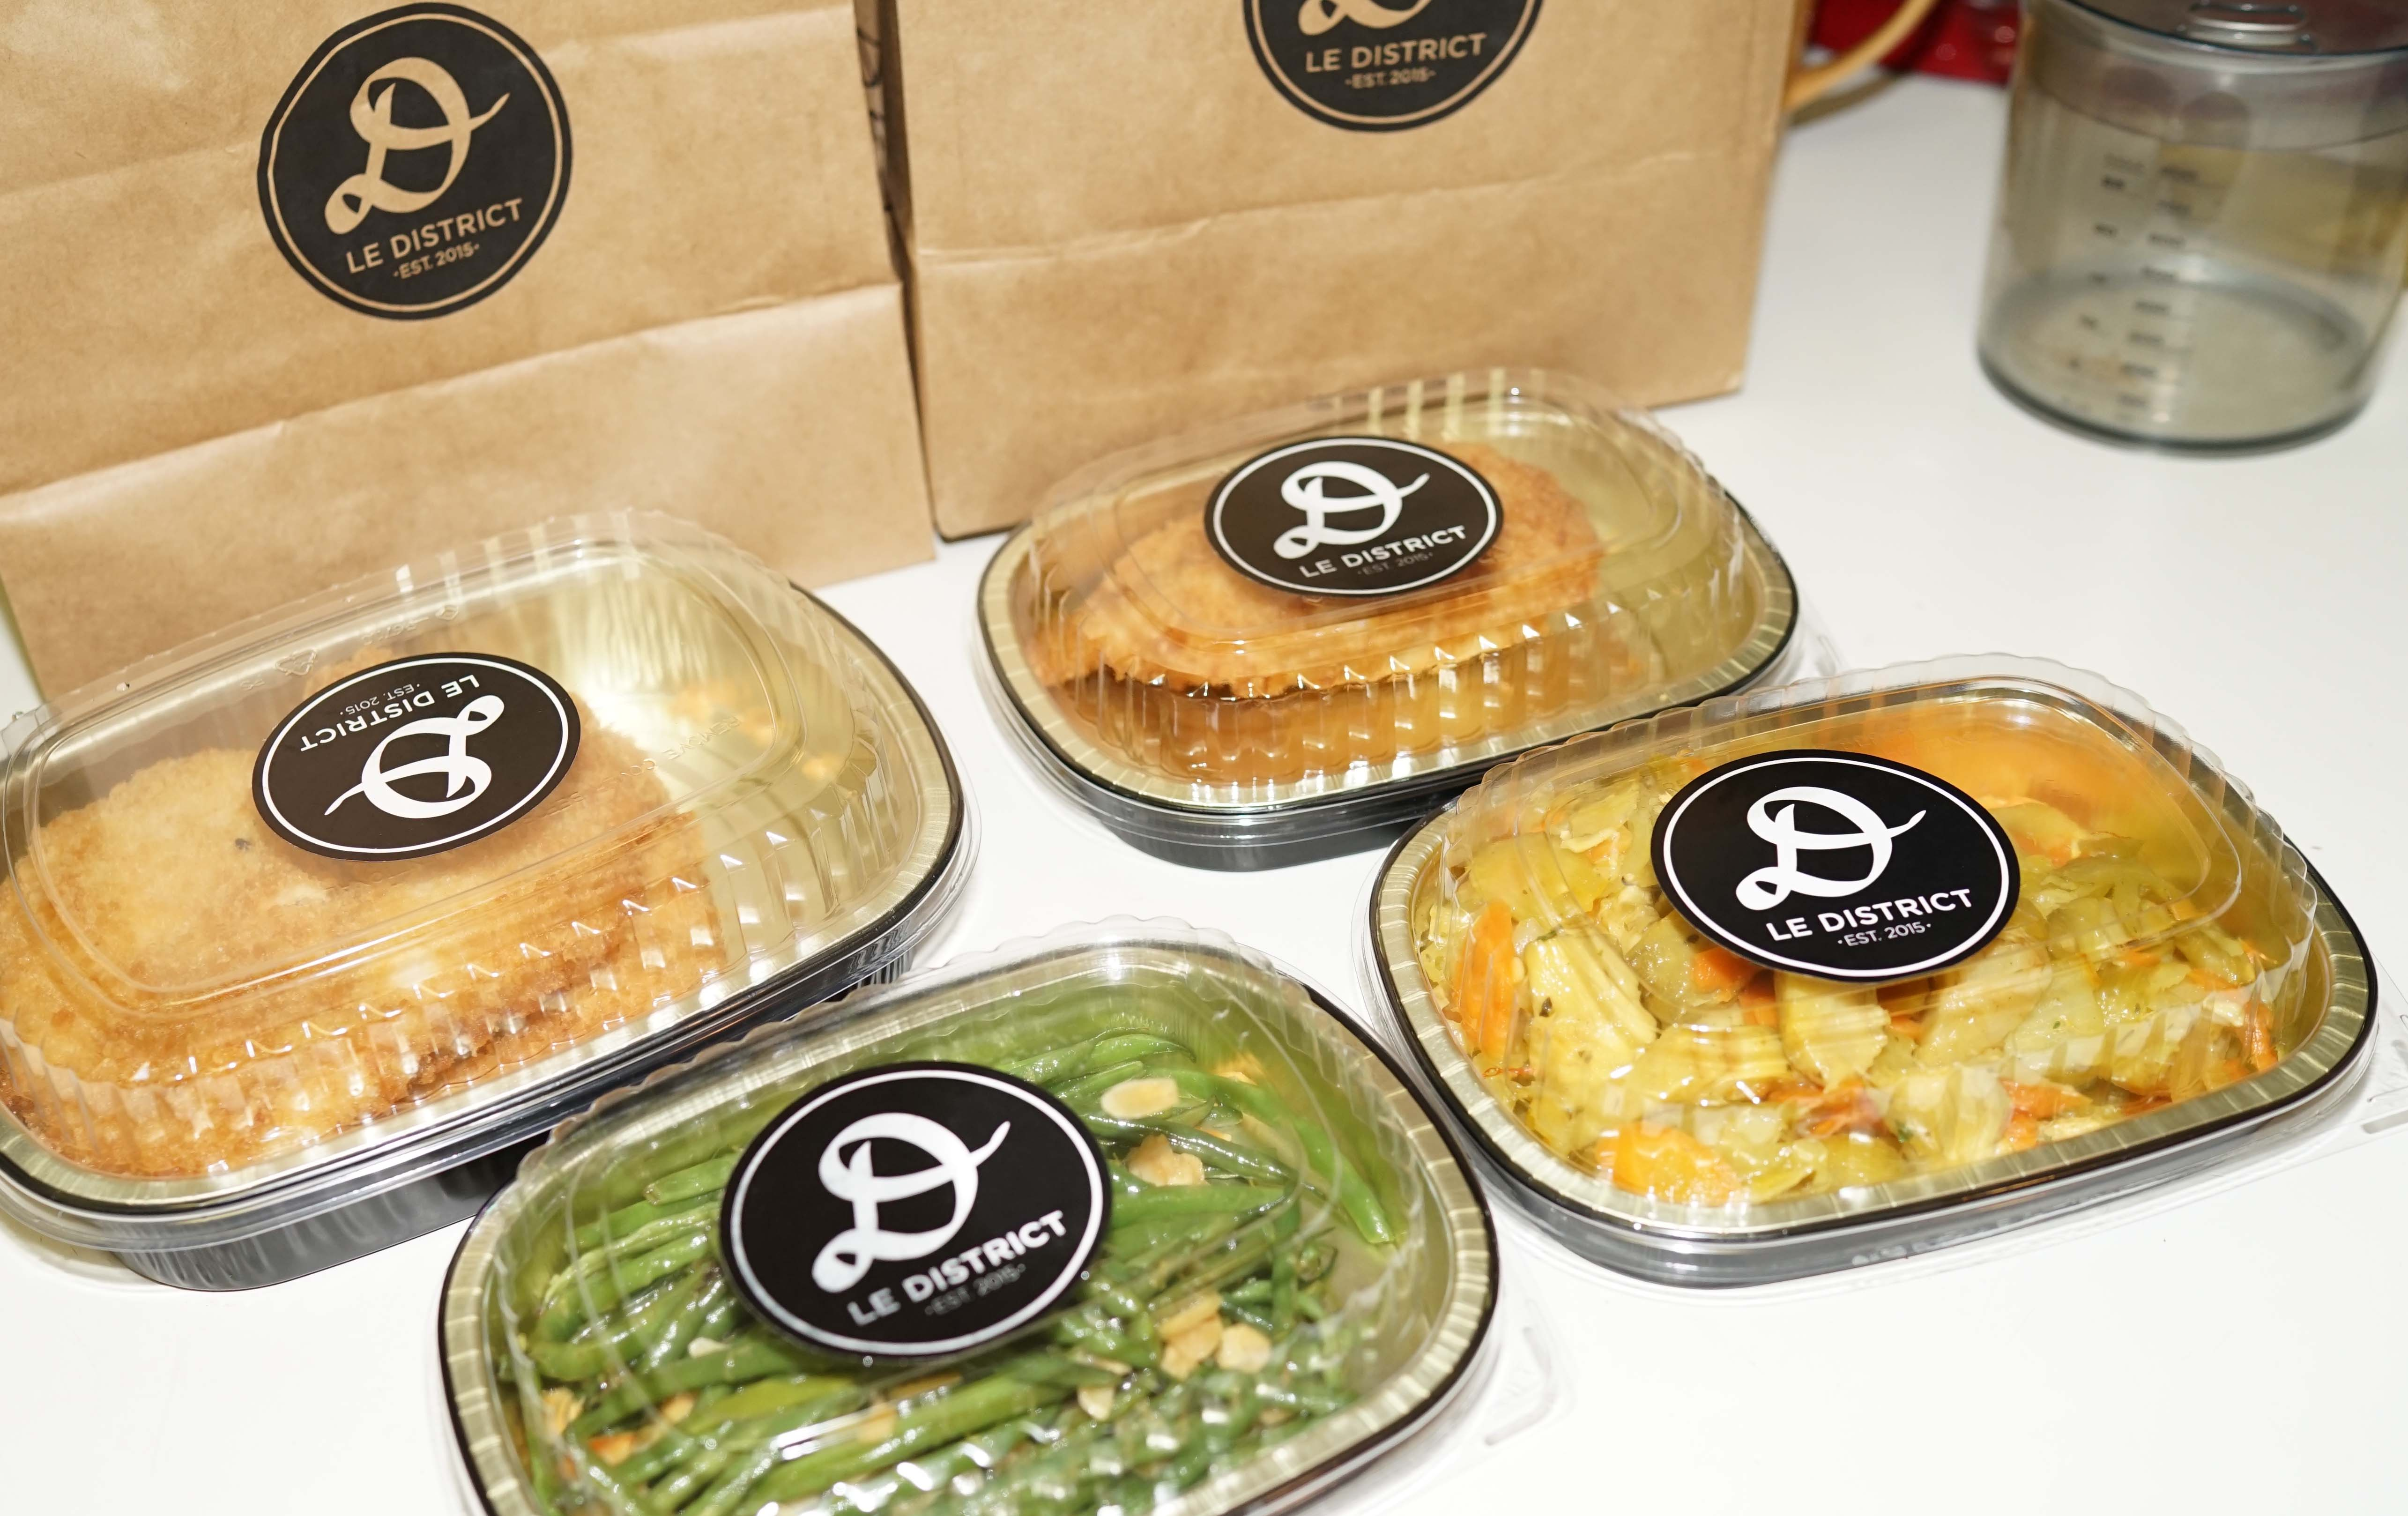 Le District prepared food